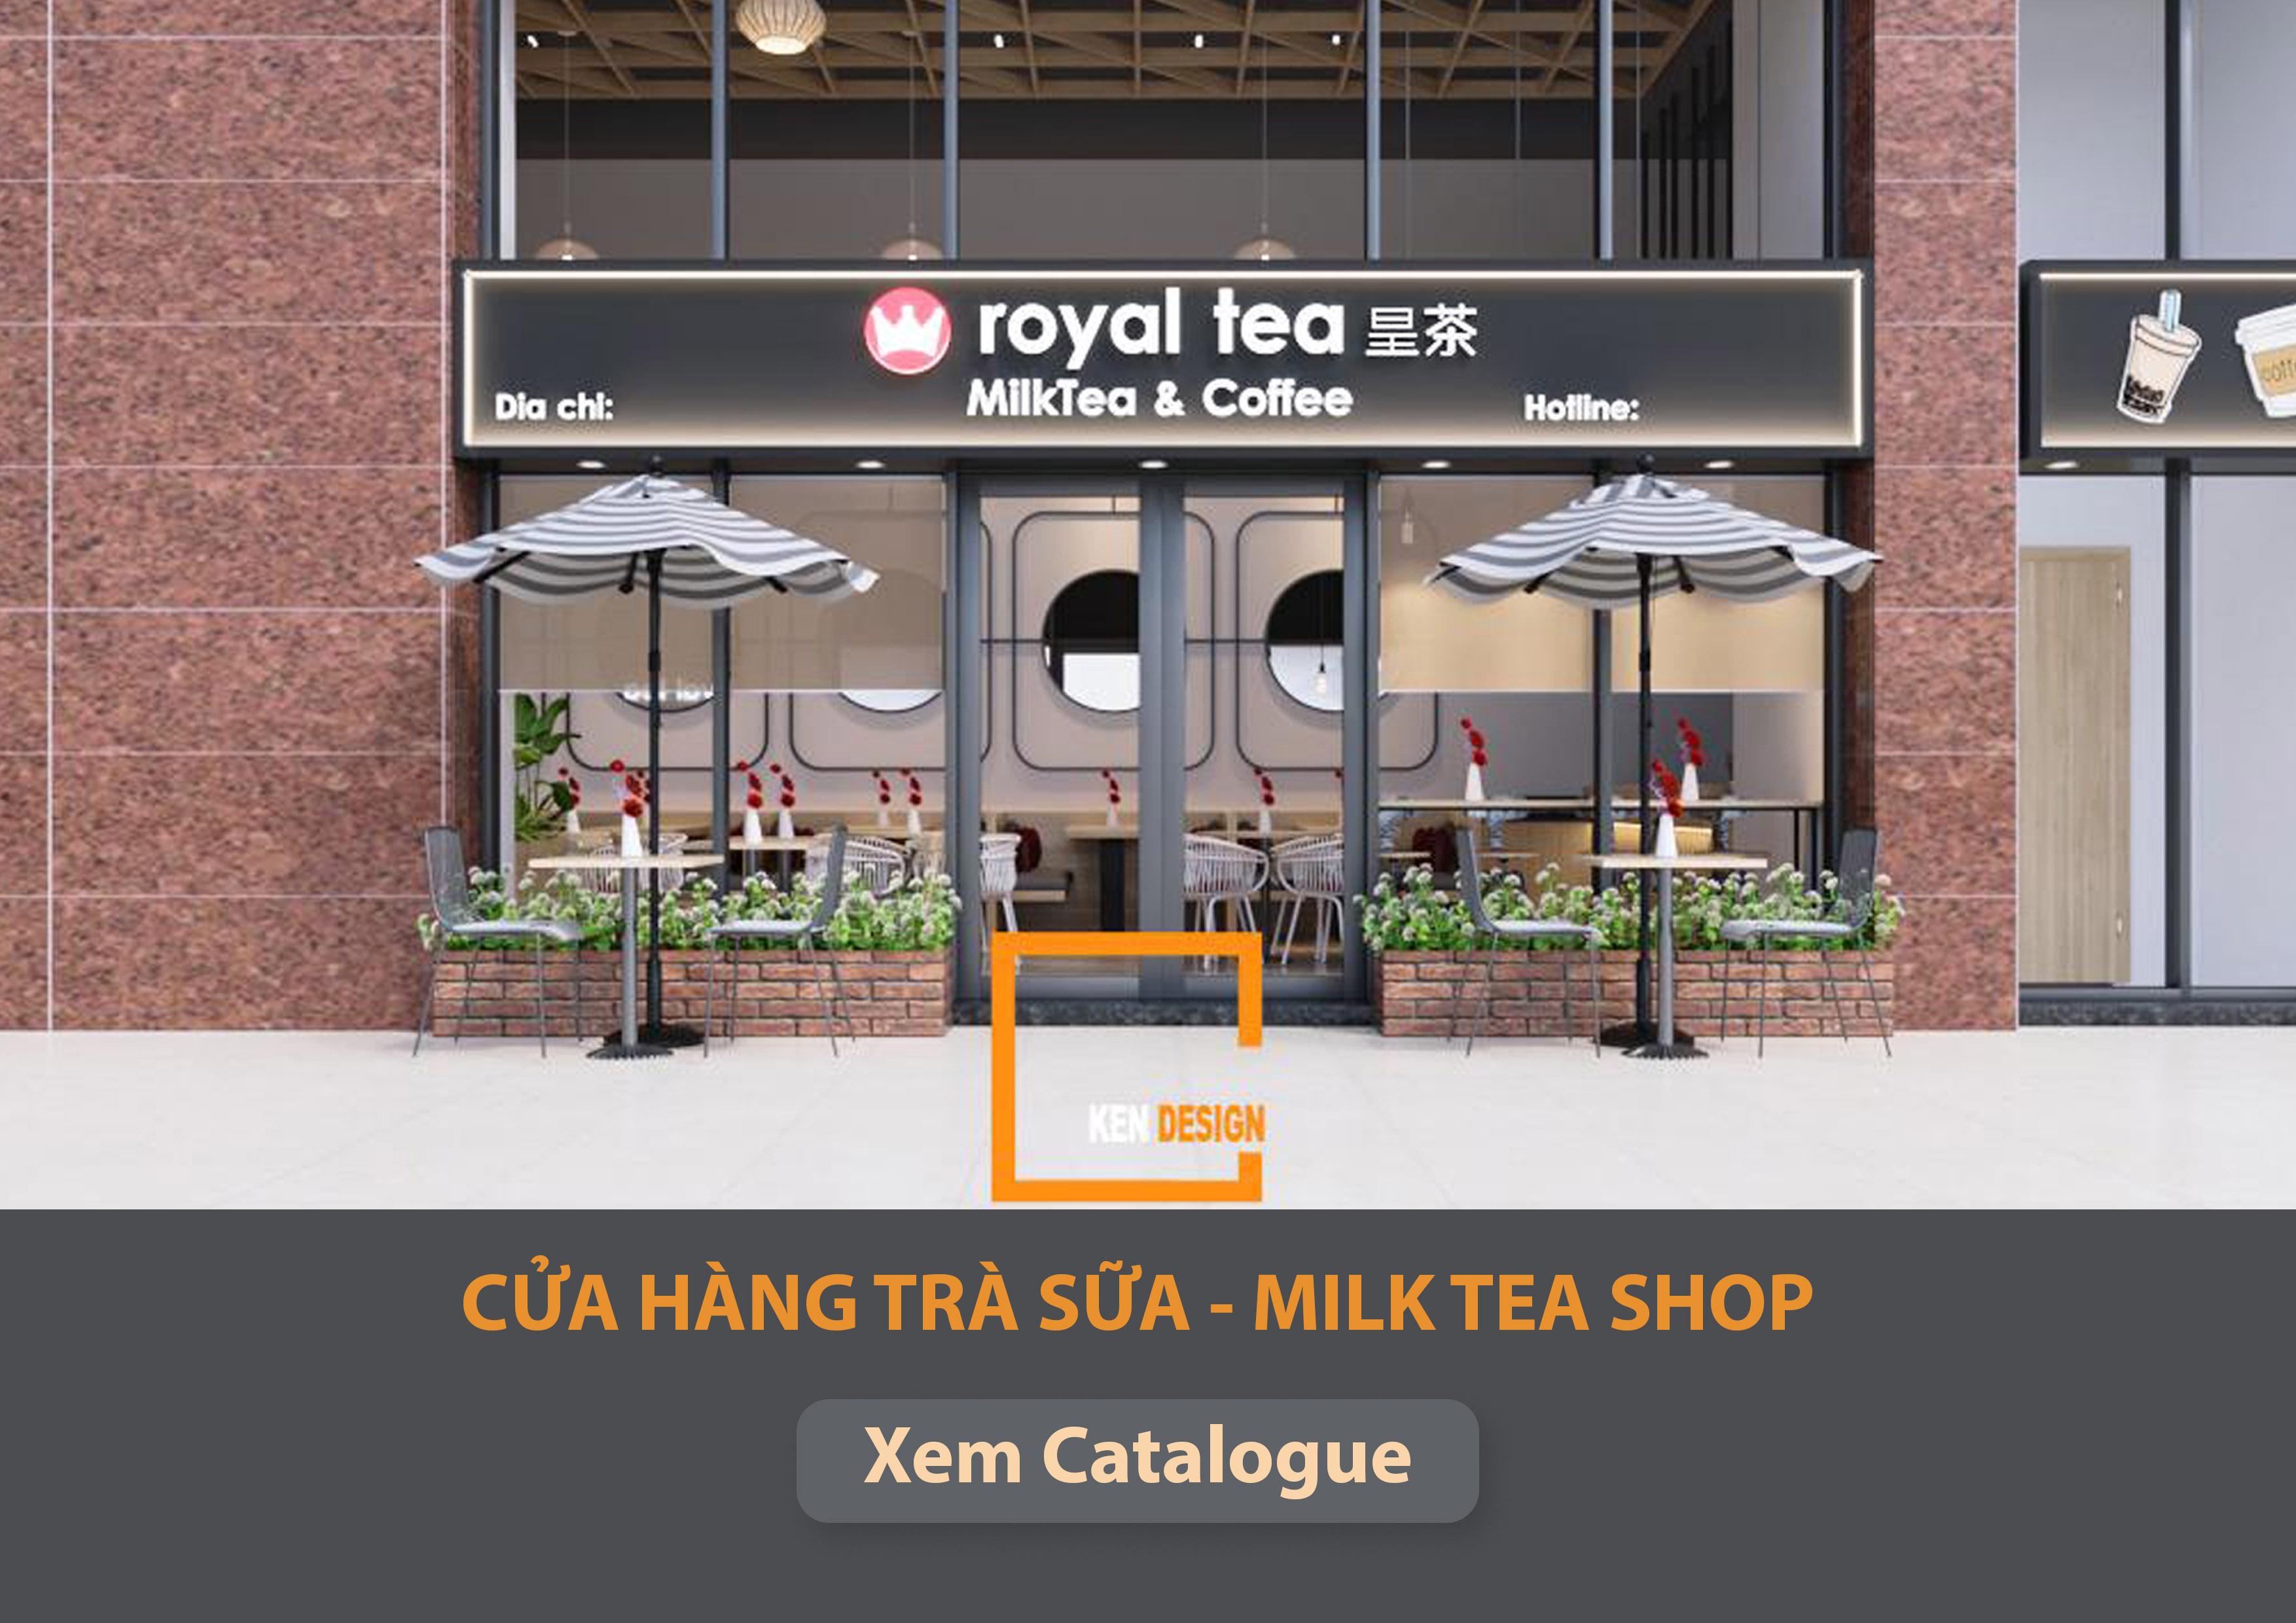 catalogue kendesign milk tea shop